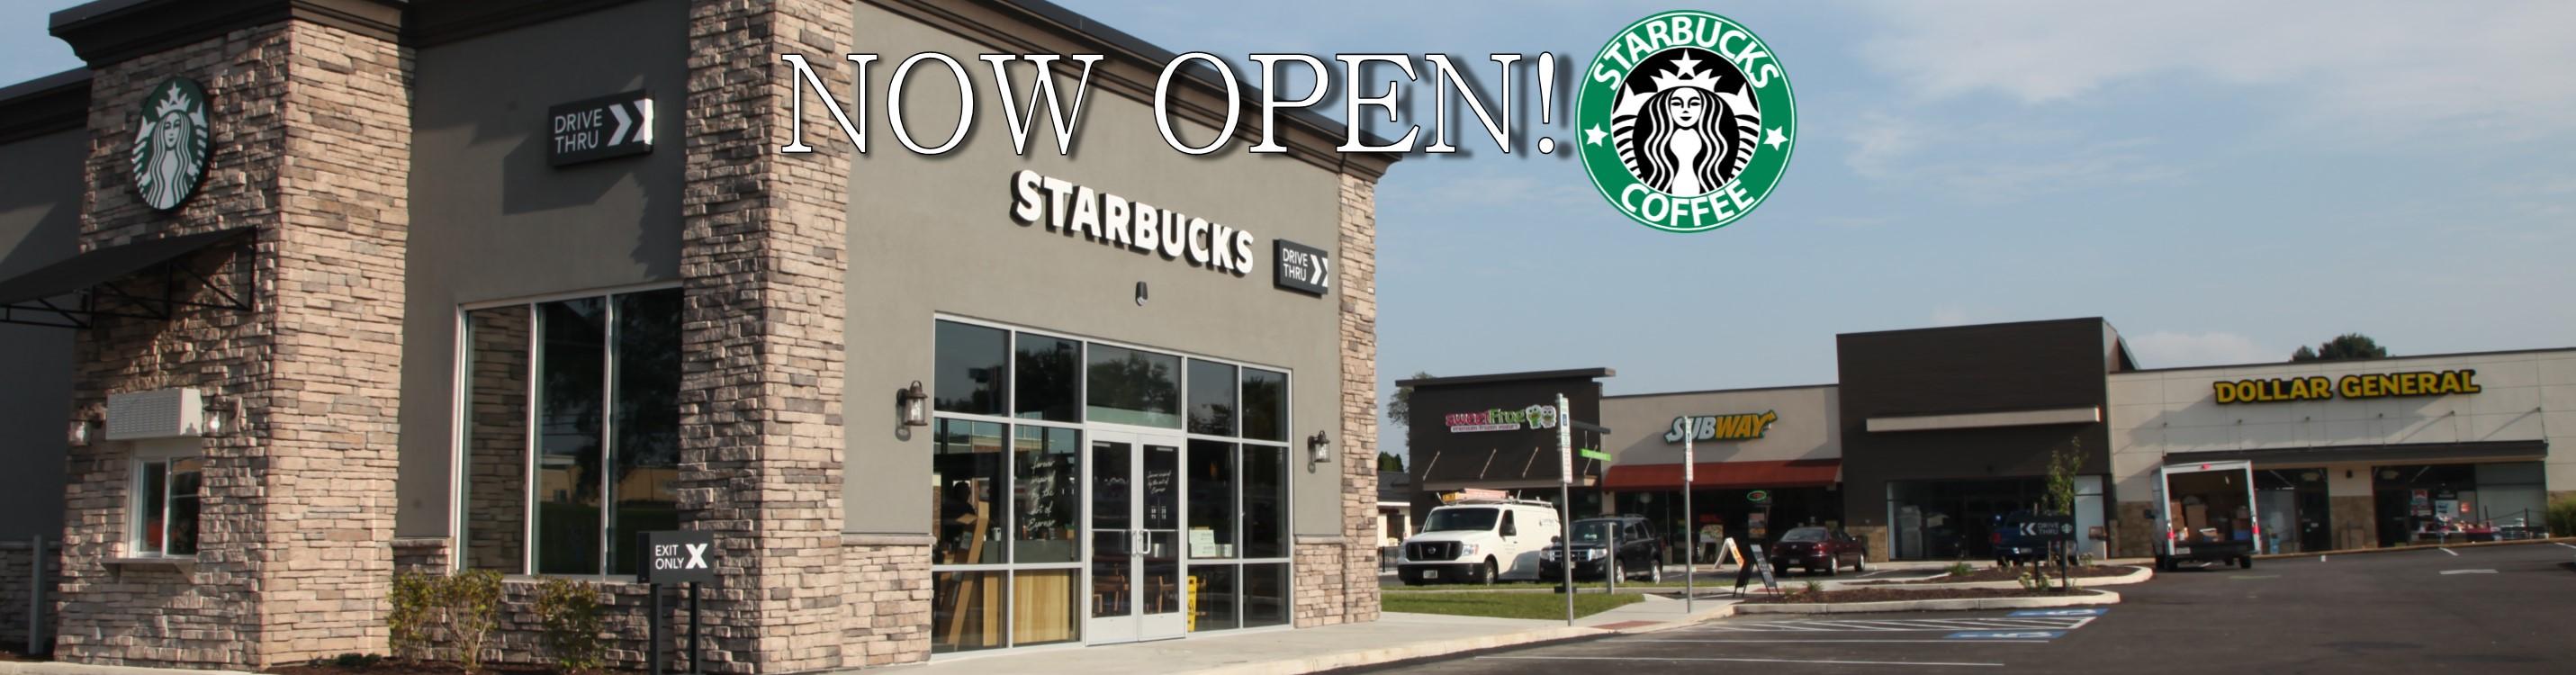 Starbucks Now Open